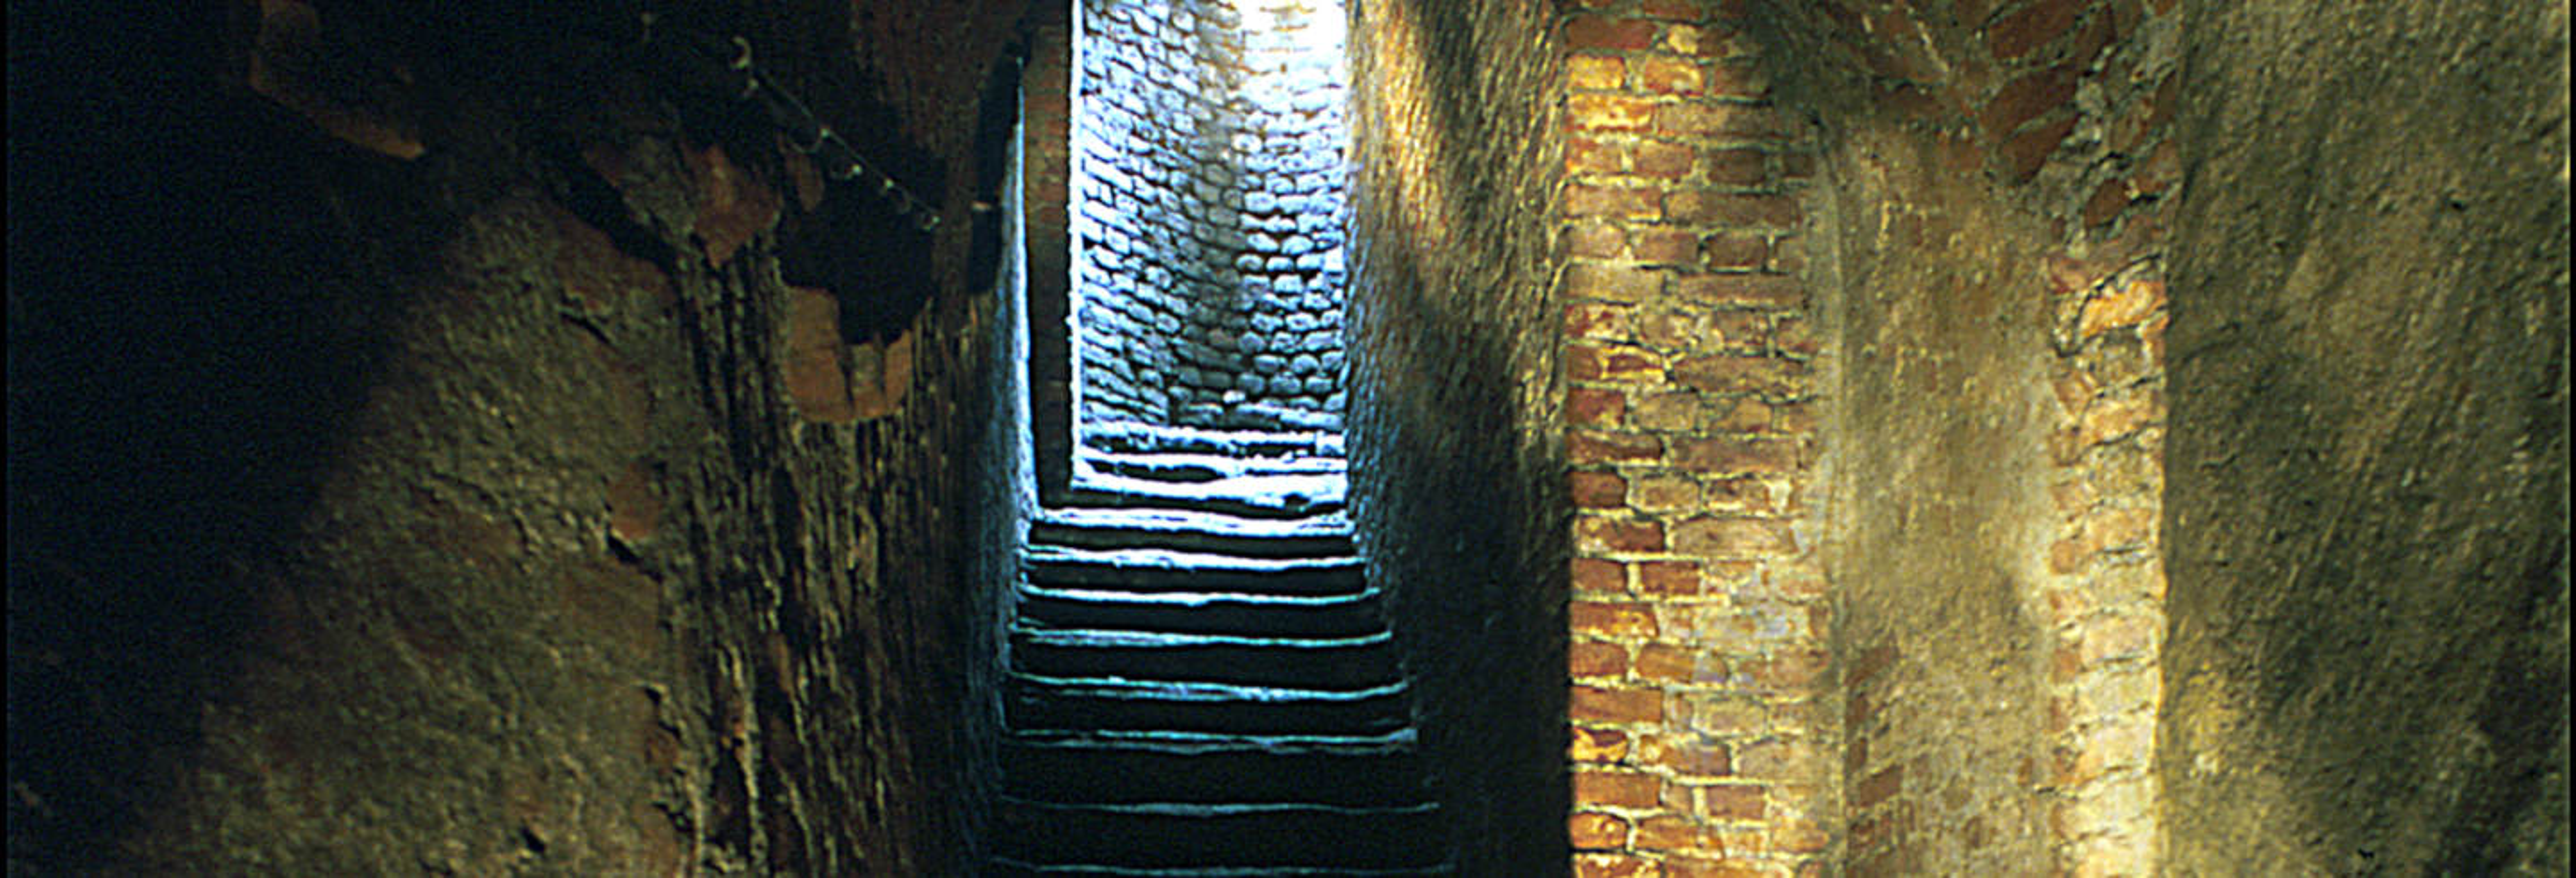 Tour por los subterráneos de Turín